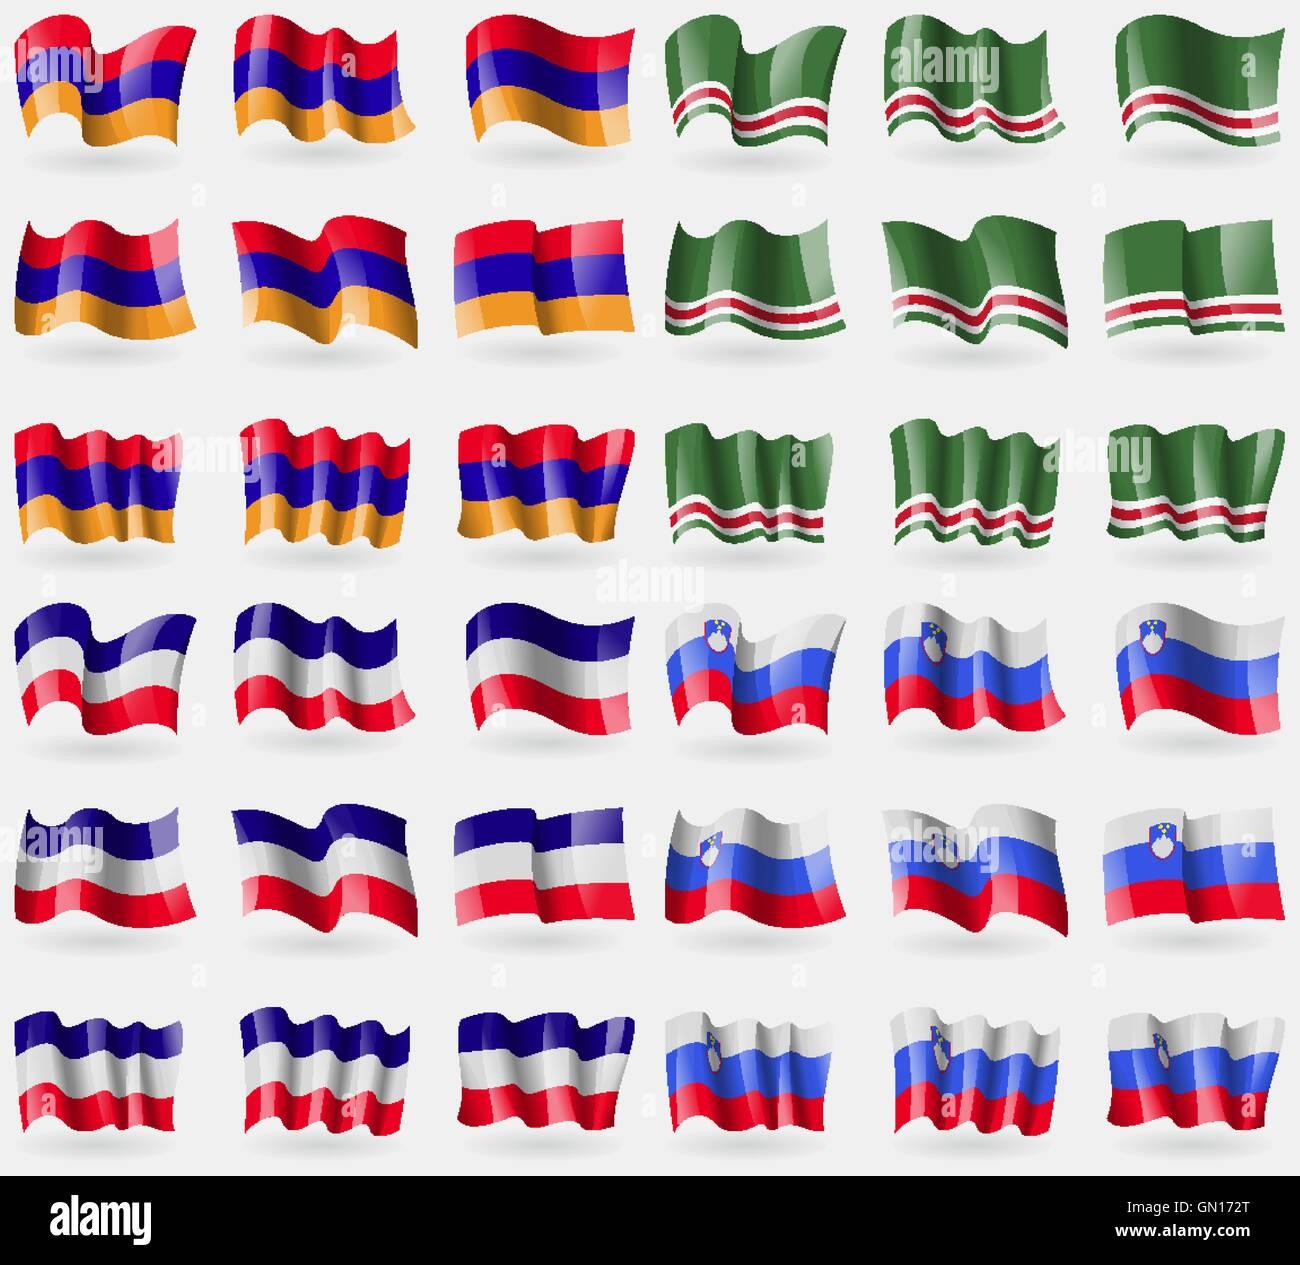 Armenia, Chechen Republic of Ichkeria, Los Altos, Slovenia. Set of 36 flags of the countries of the world. Vector - Stock Image